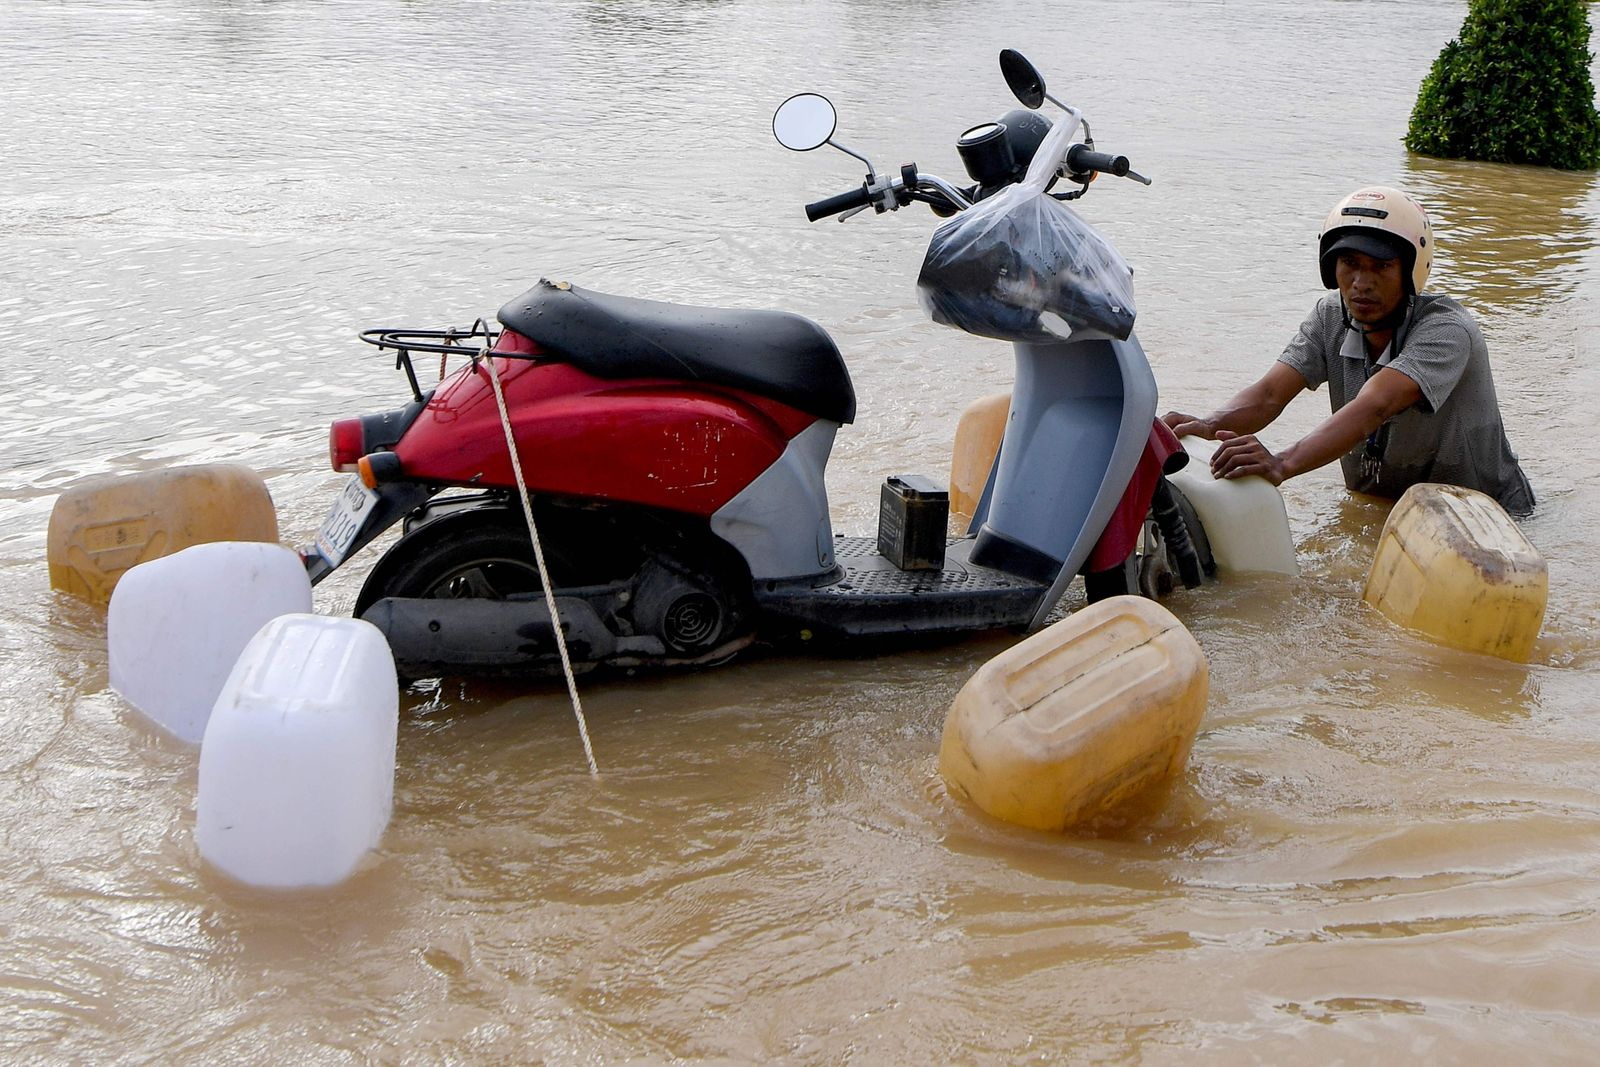 CAMBODIA-WEATHER-FLOOD